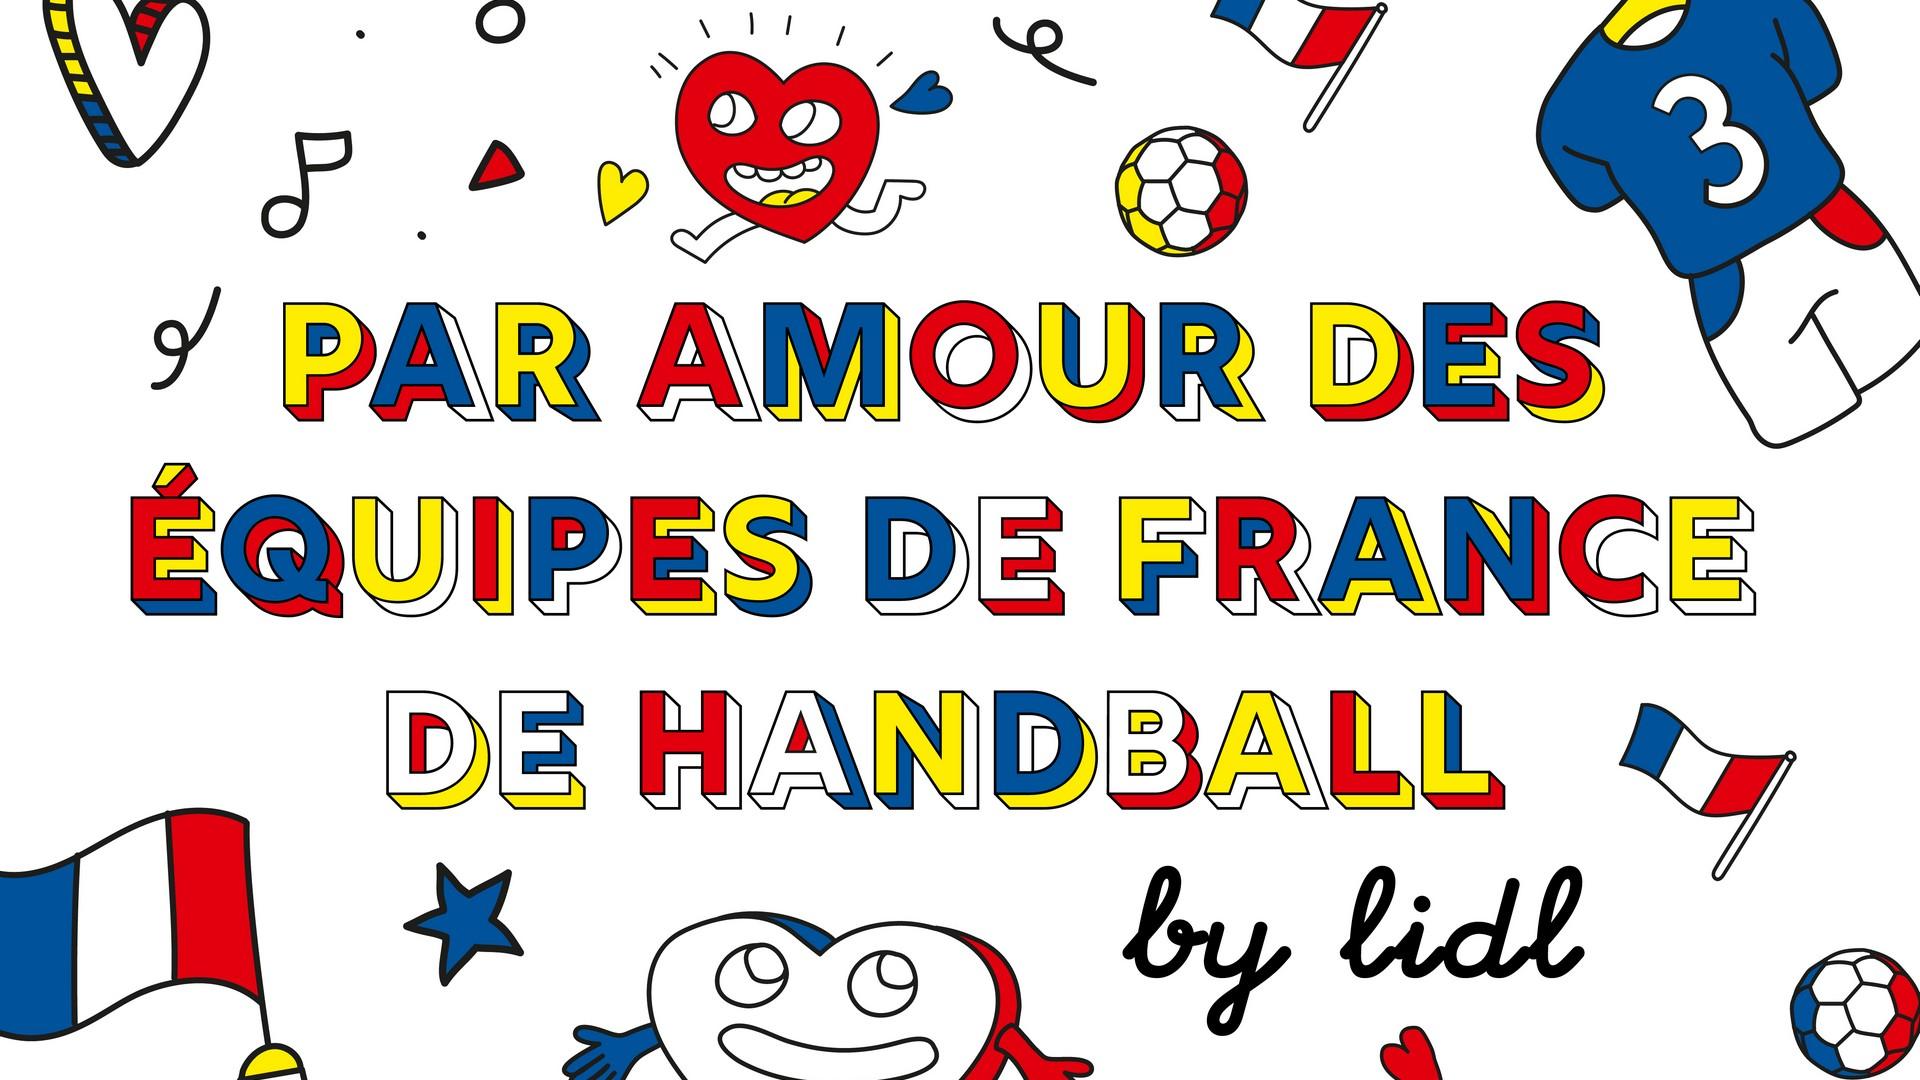 Lidl Par amour des équipes de France de handball (1)